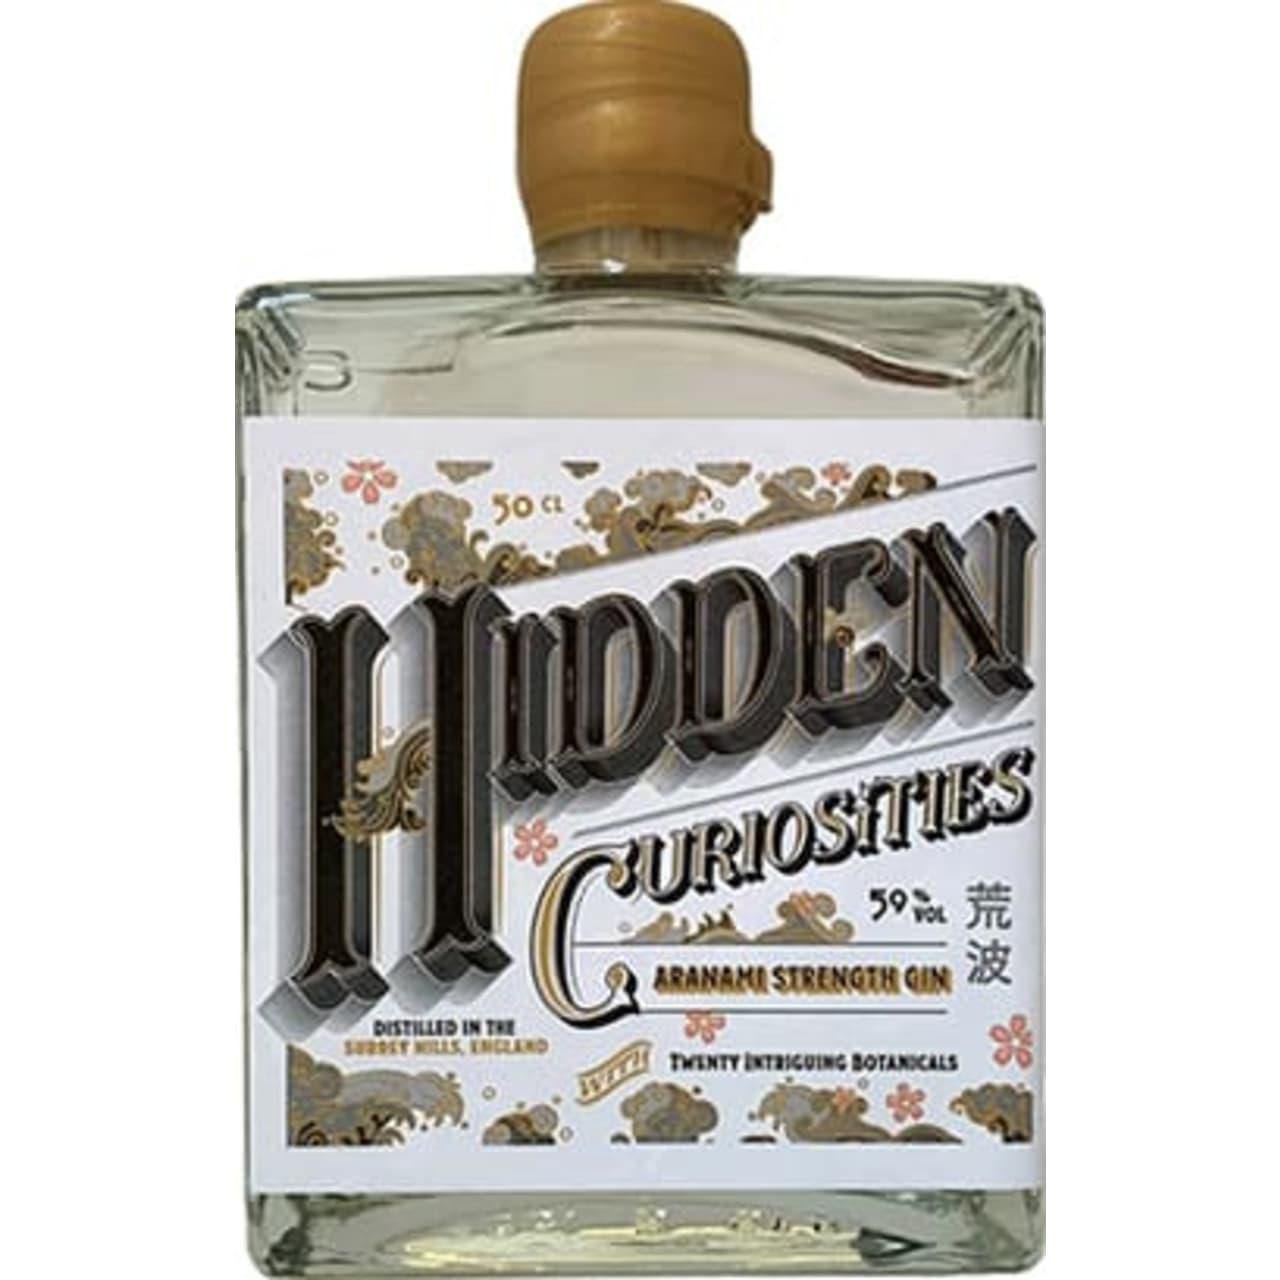 Product Image - Hidden Curiosities Aranami Strength Gin